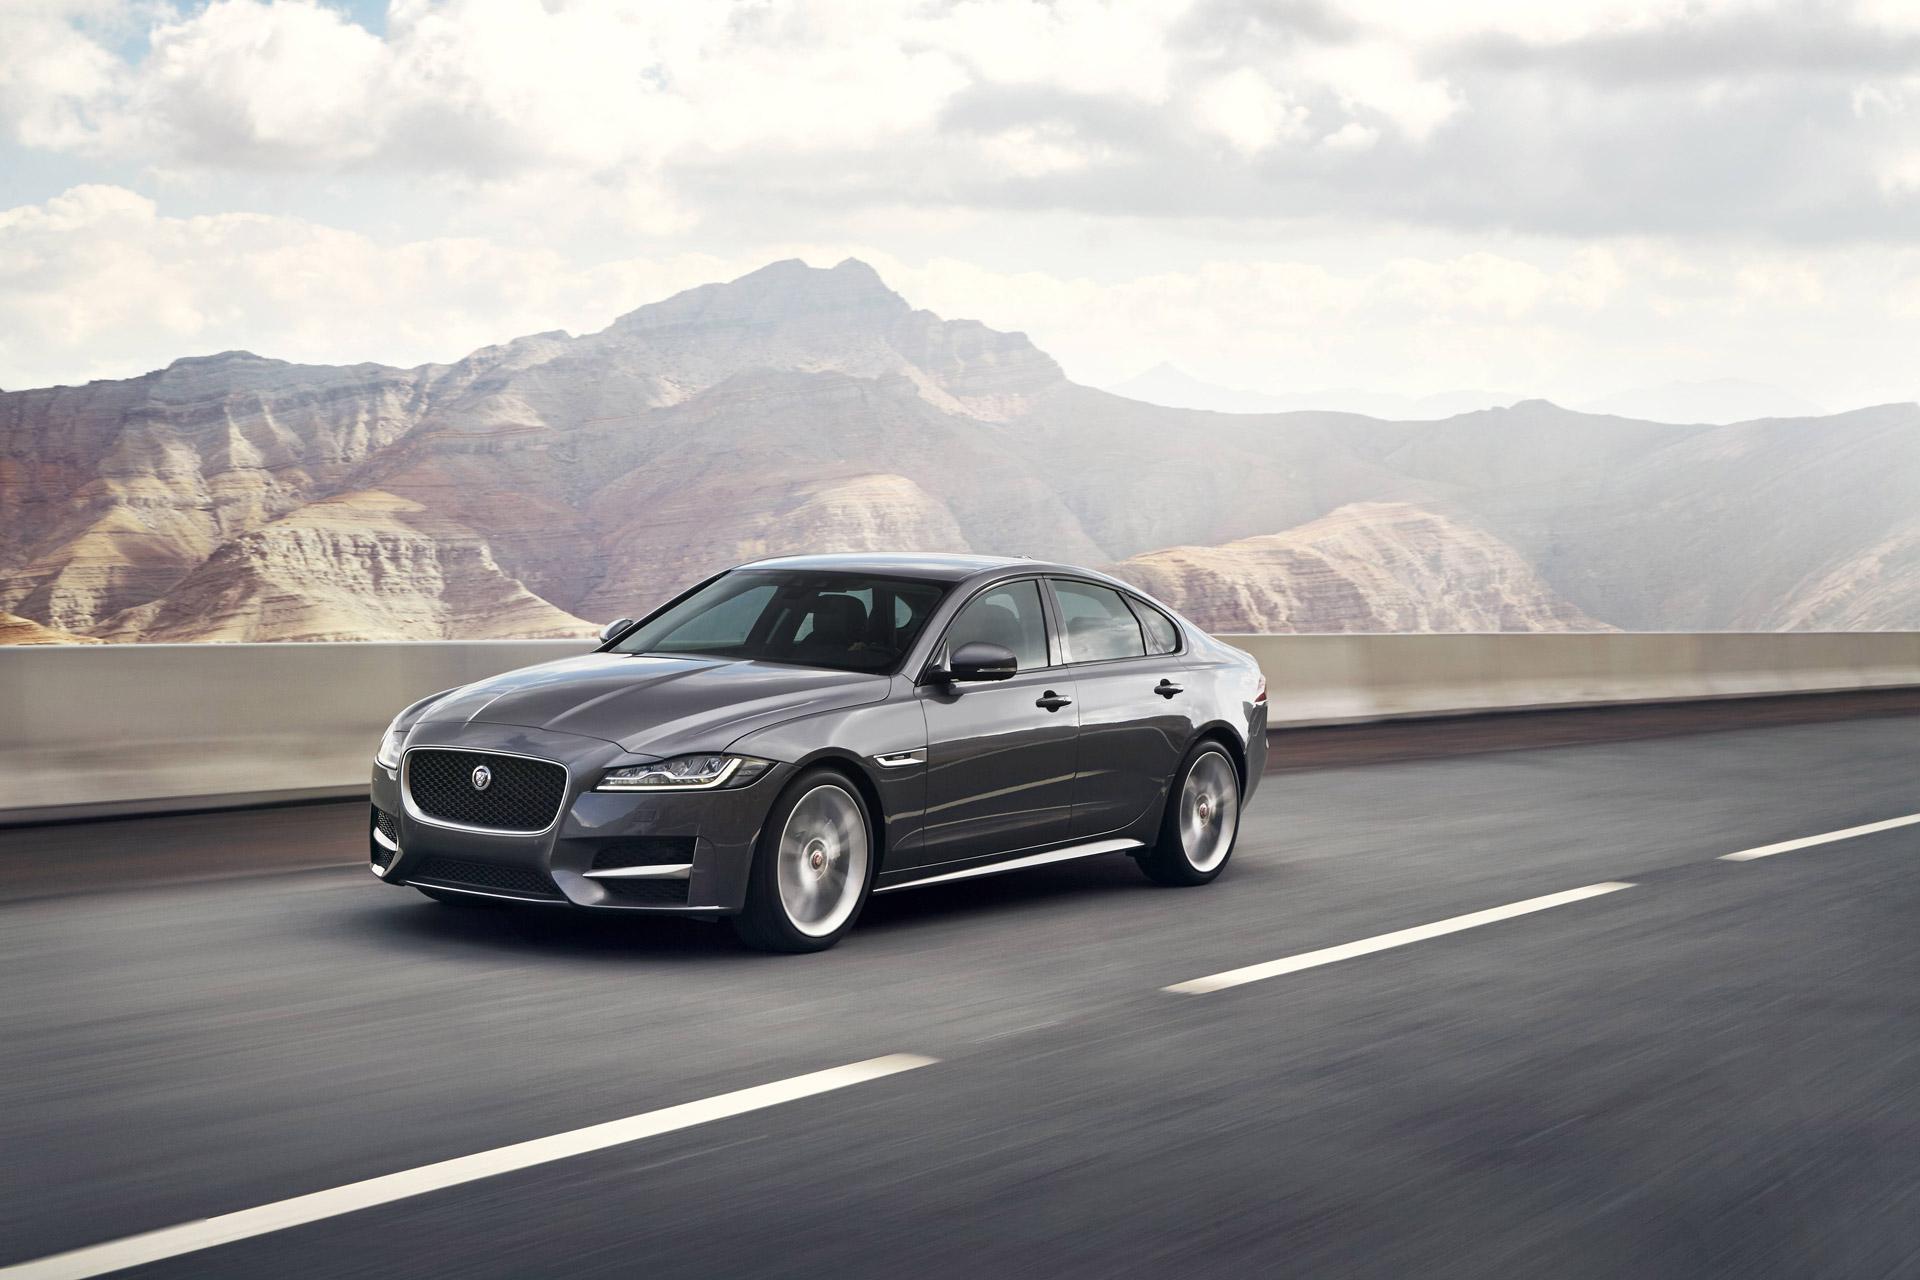 Jaguar Bets On Lower Prices, EliteCare For Sales Reboot